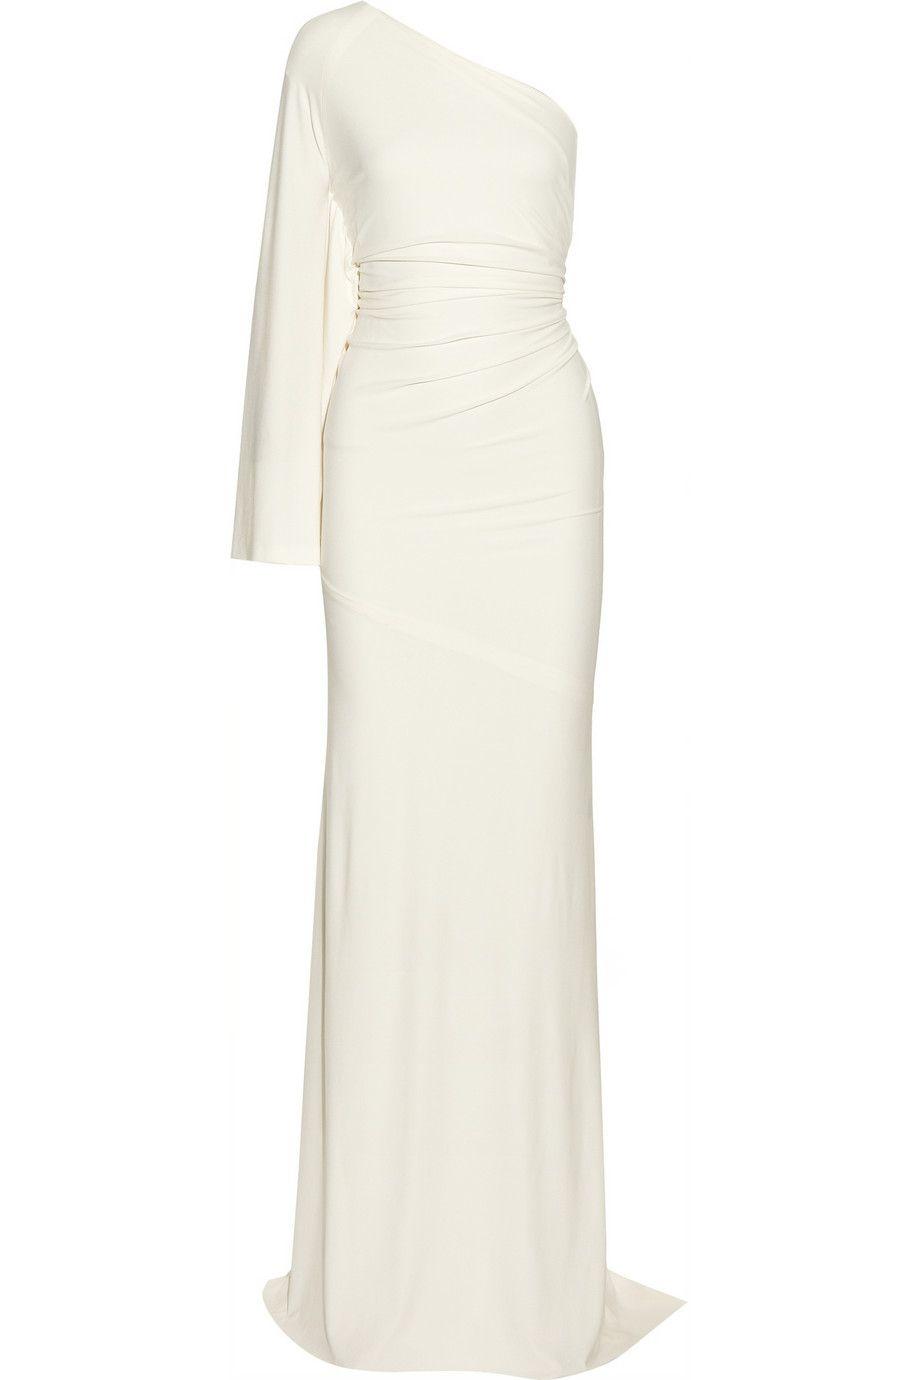 12 Non Typical Designer Wedding Dresses Featuring Lanvin Temperley Hervé Léger Roland